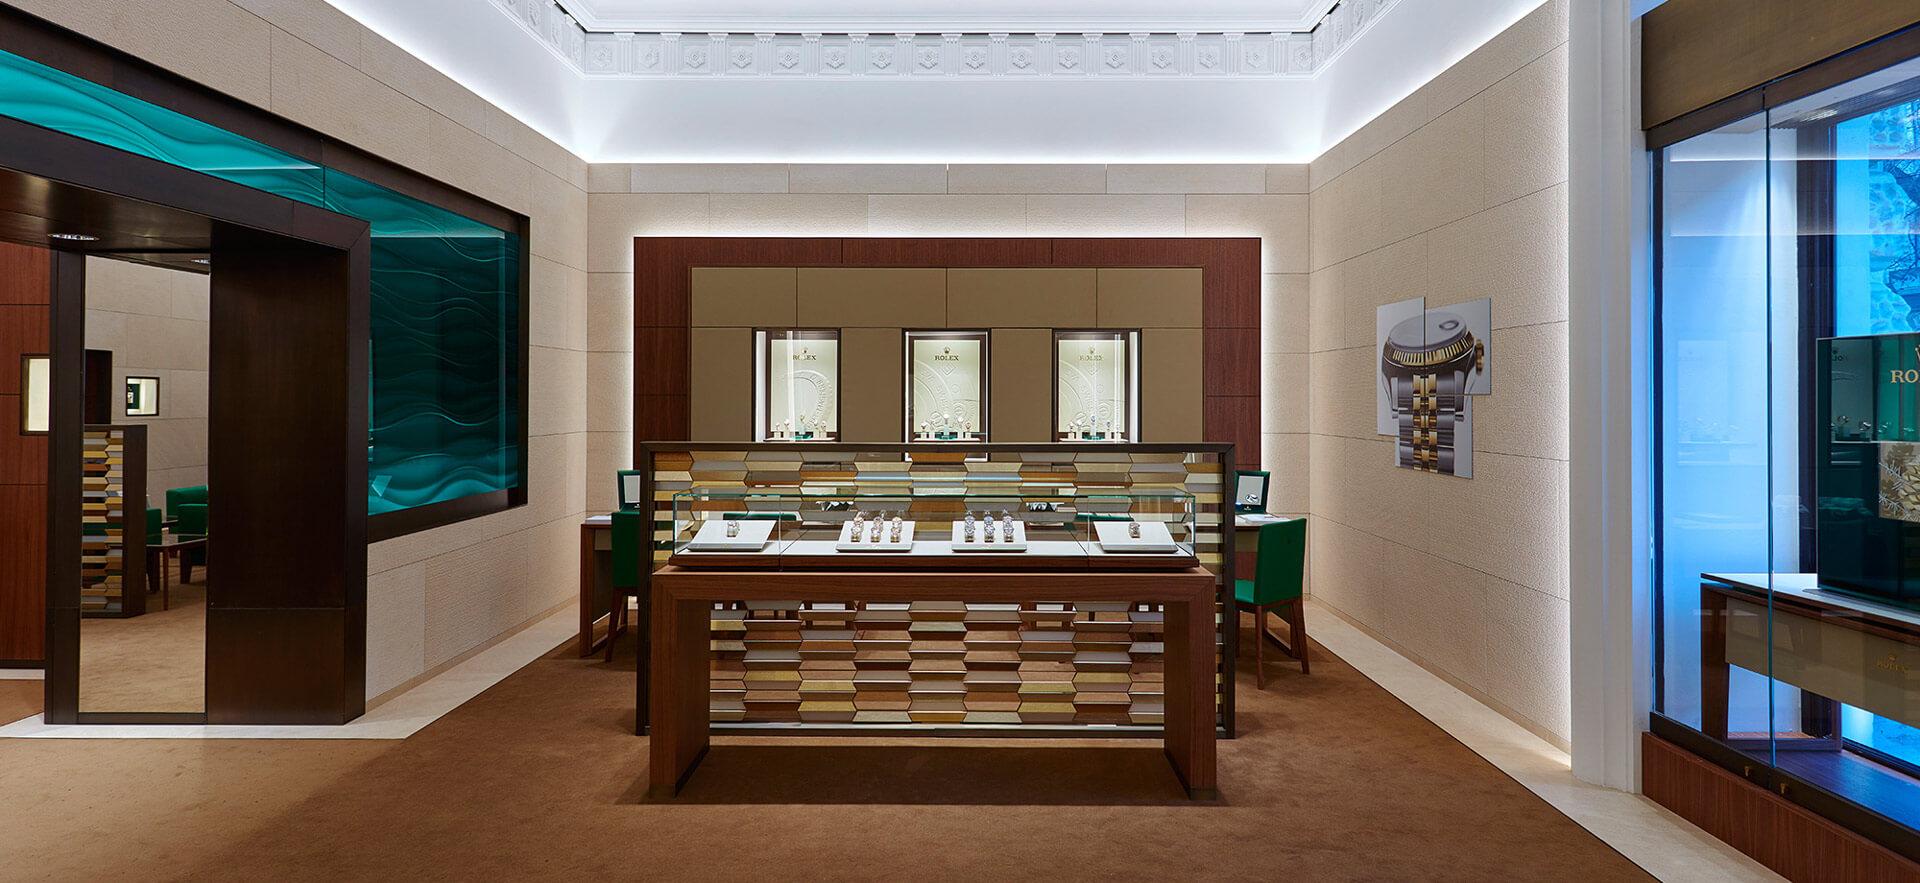 Rolex butik - Budimpešta - Petite Geneve Petrovic